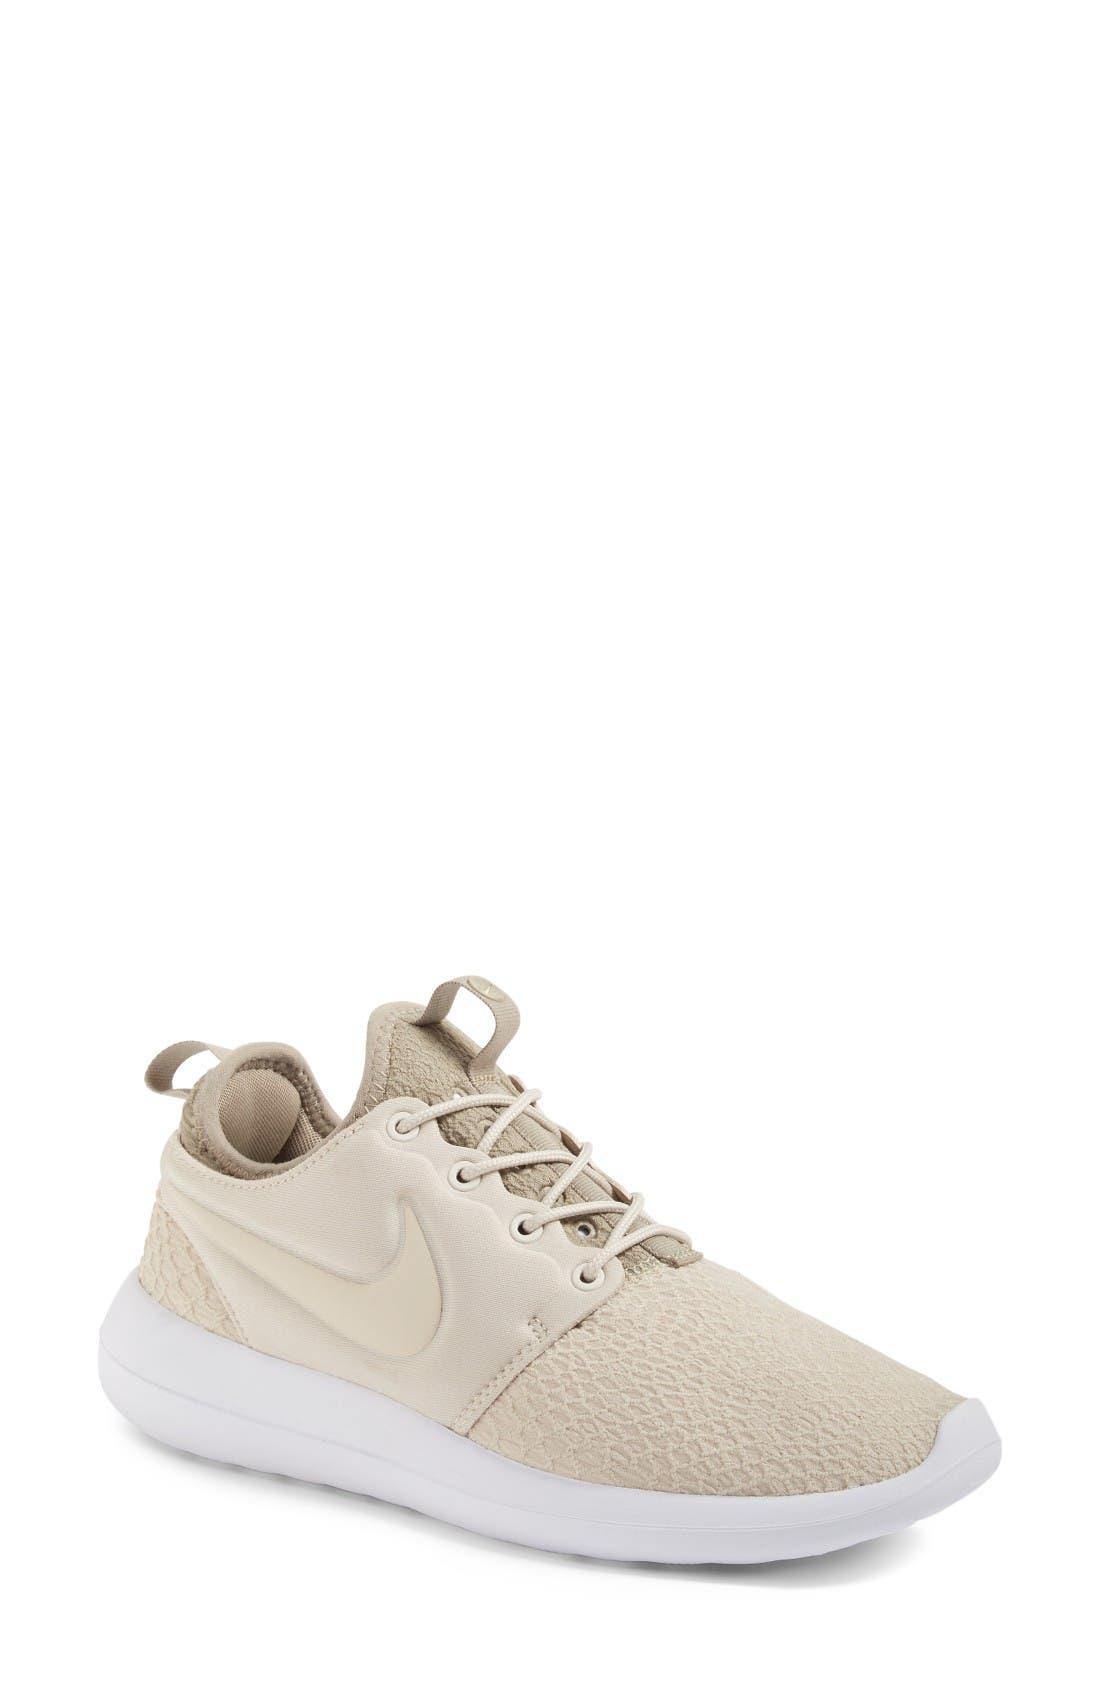 Nike Roshe 2 Des Femmes De Nordstroms